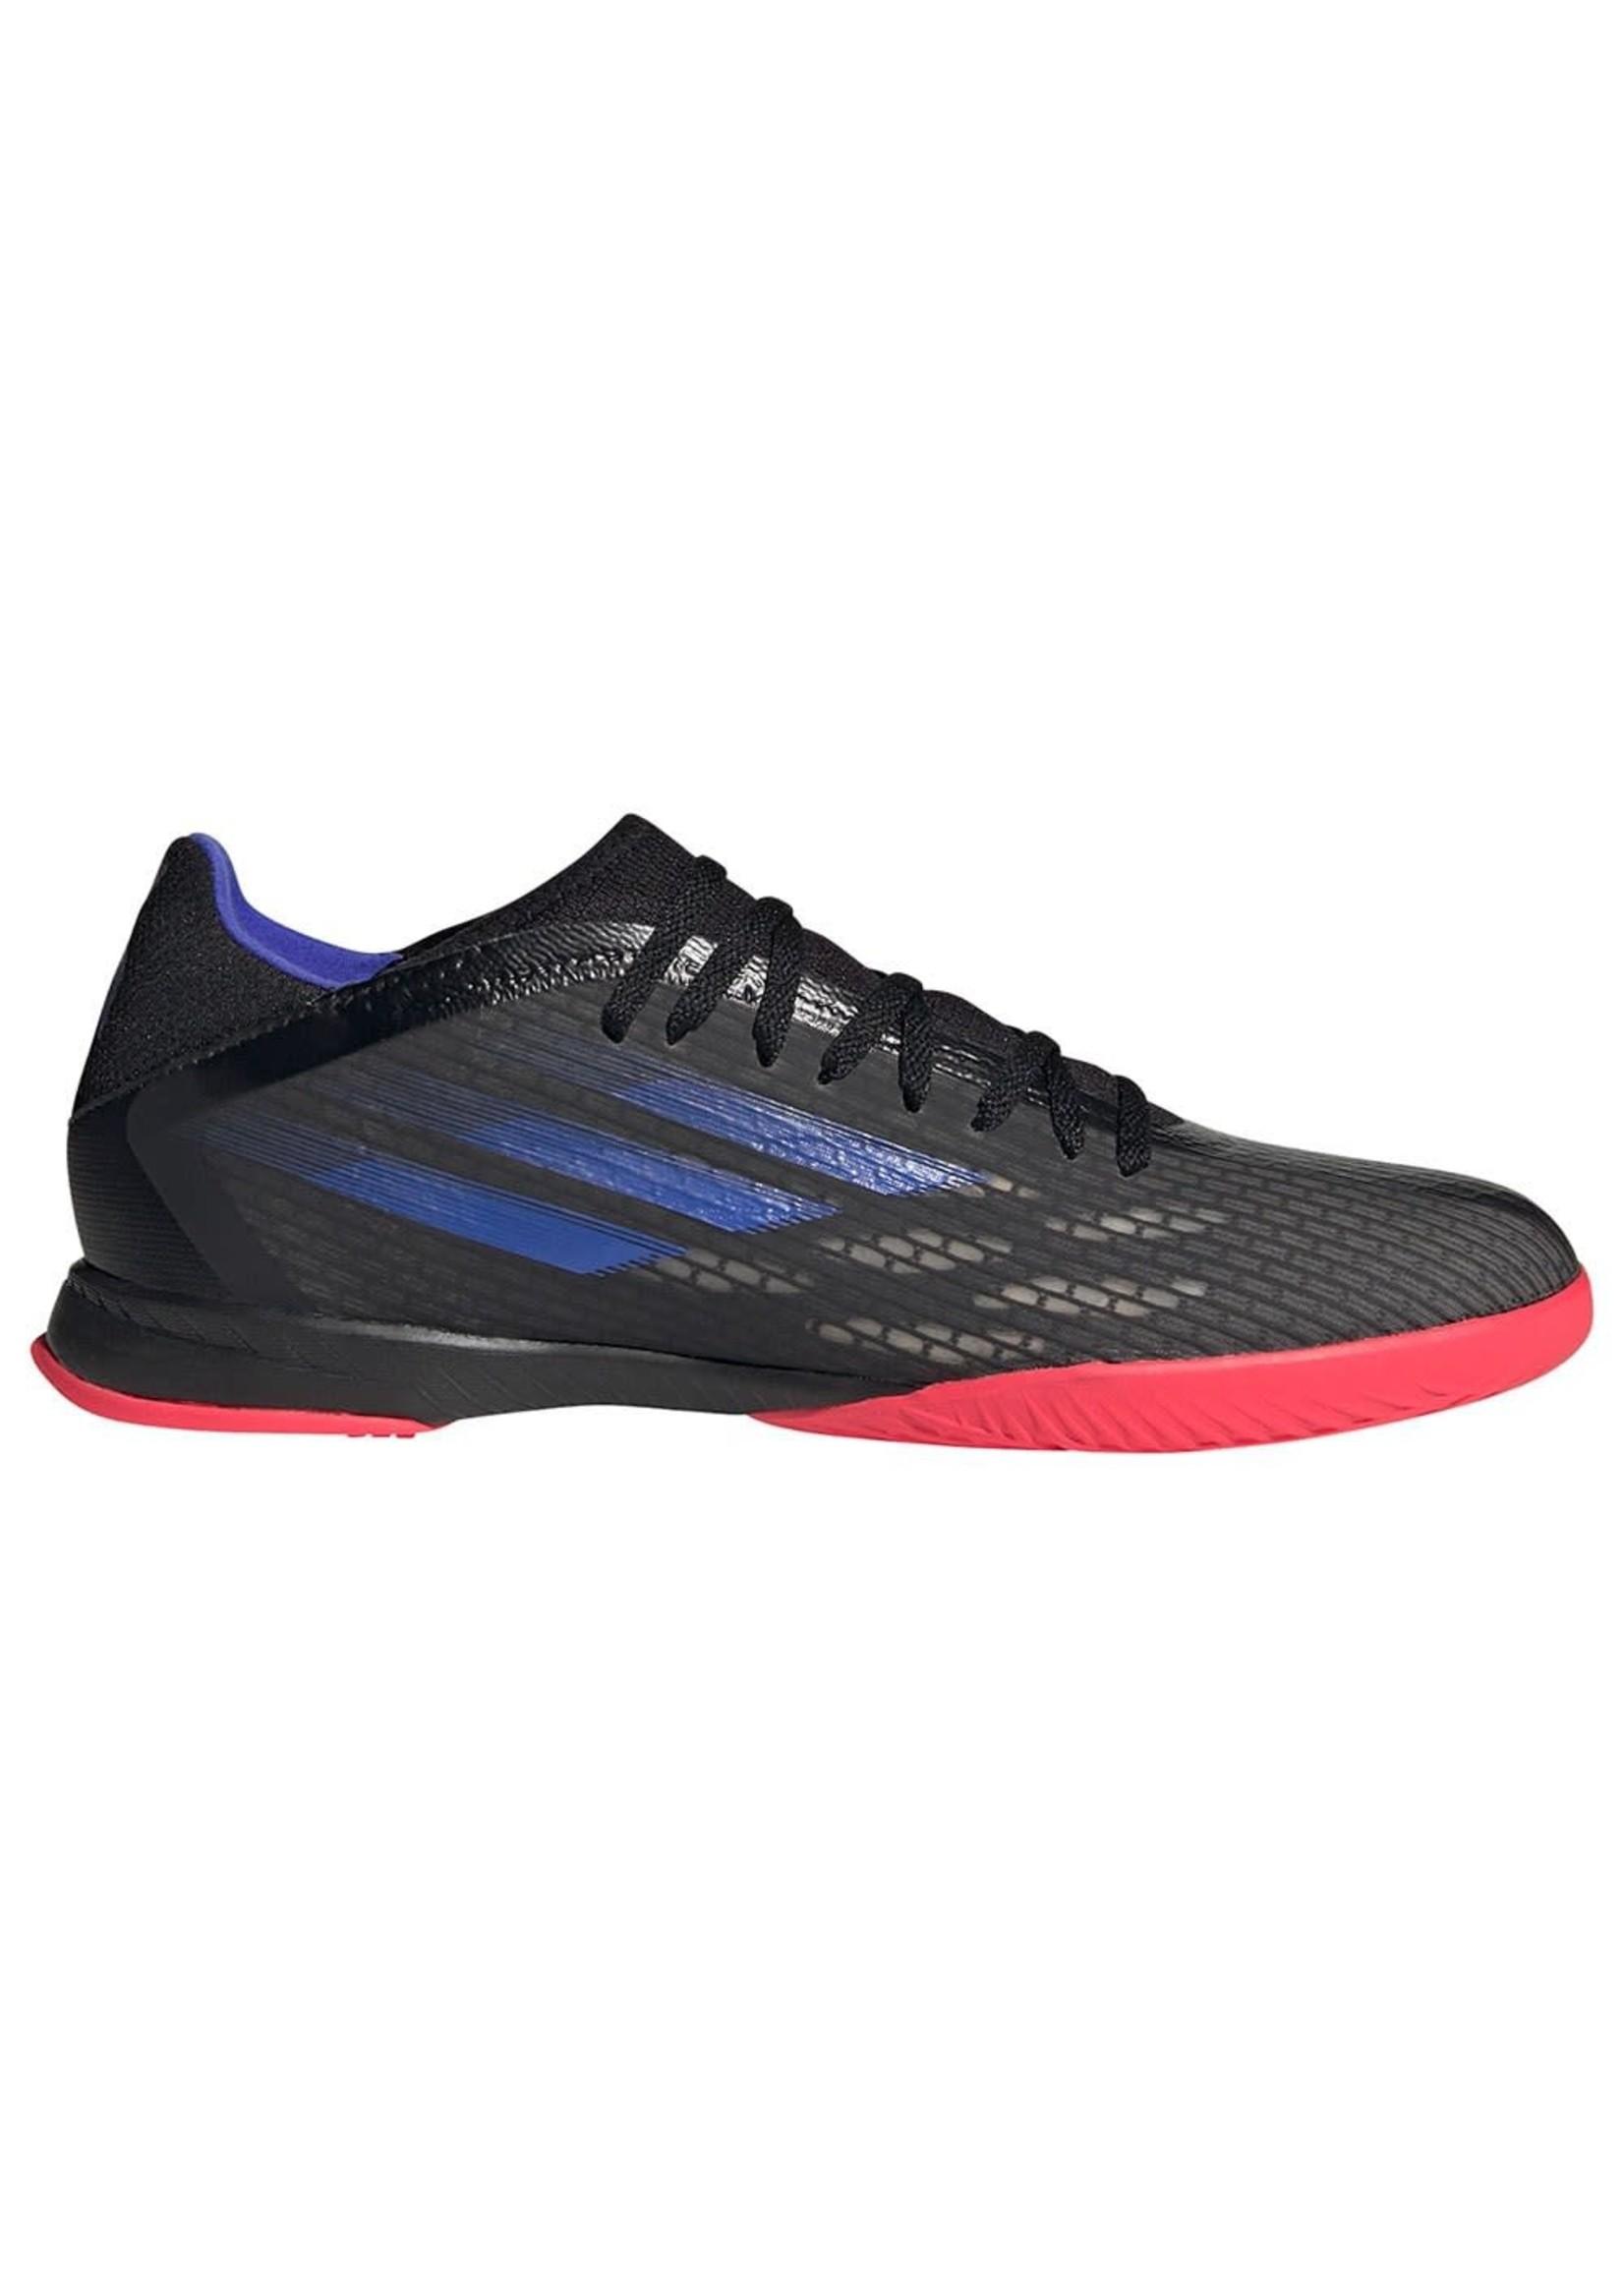 Adidas X SPEEDFLOW .3 IN